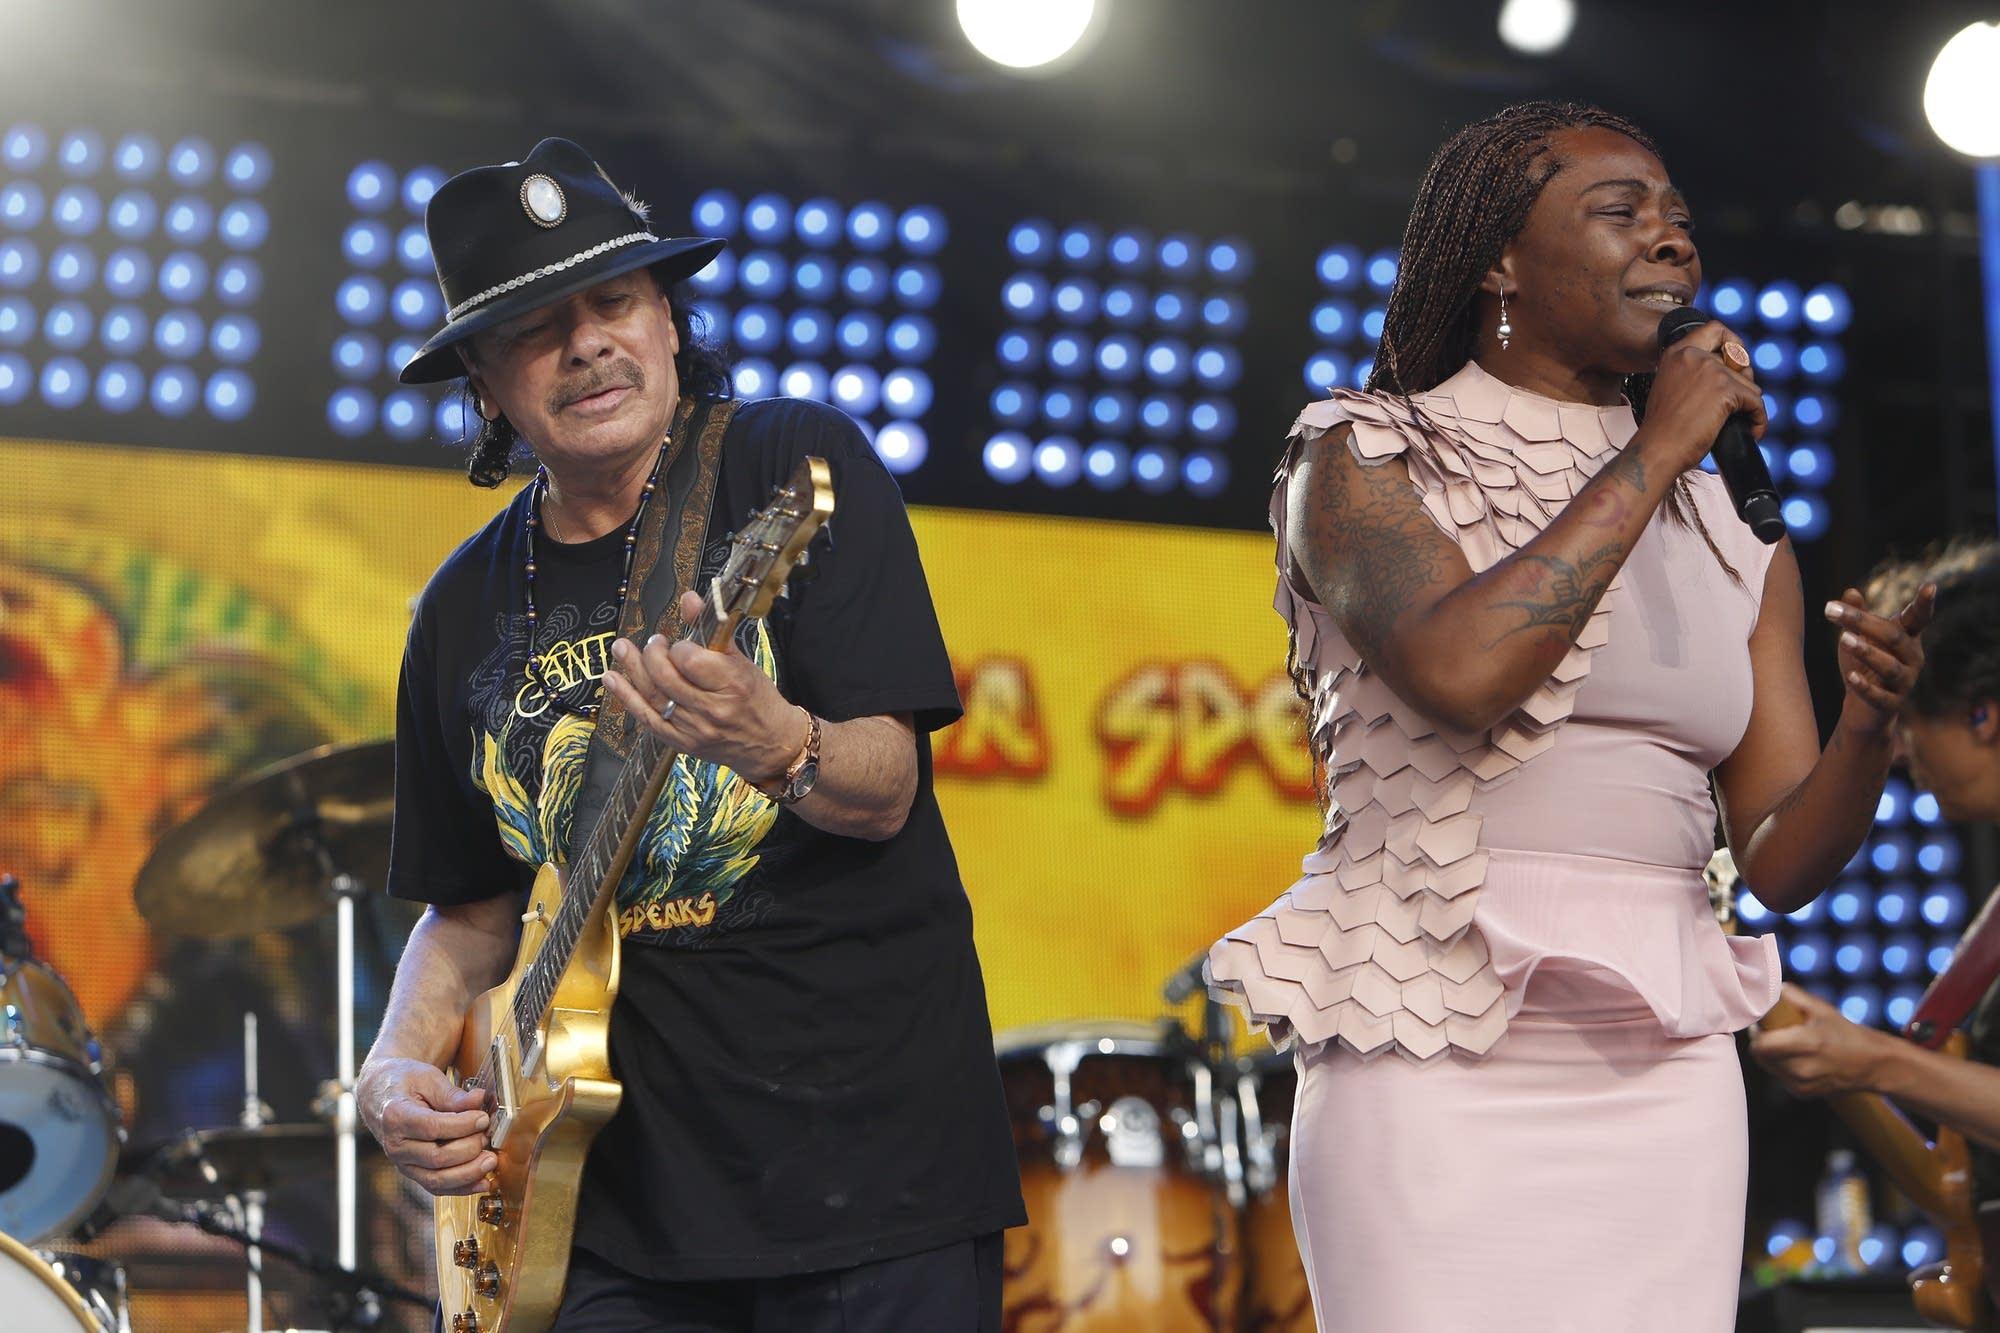 Santana performs on 'Jimmy Kimmel Live!'